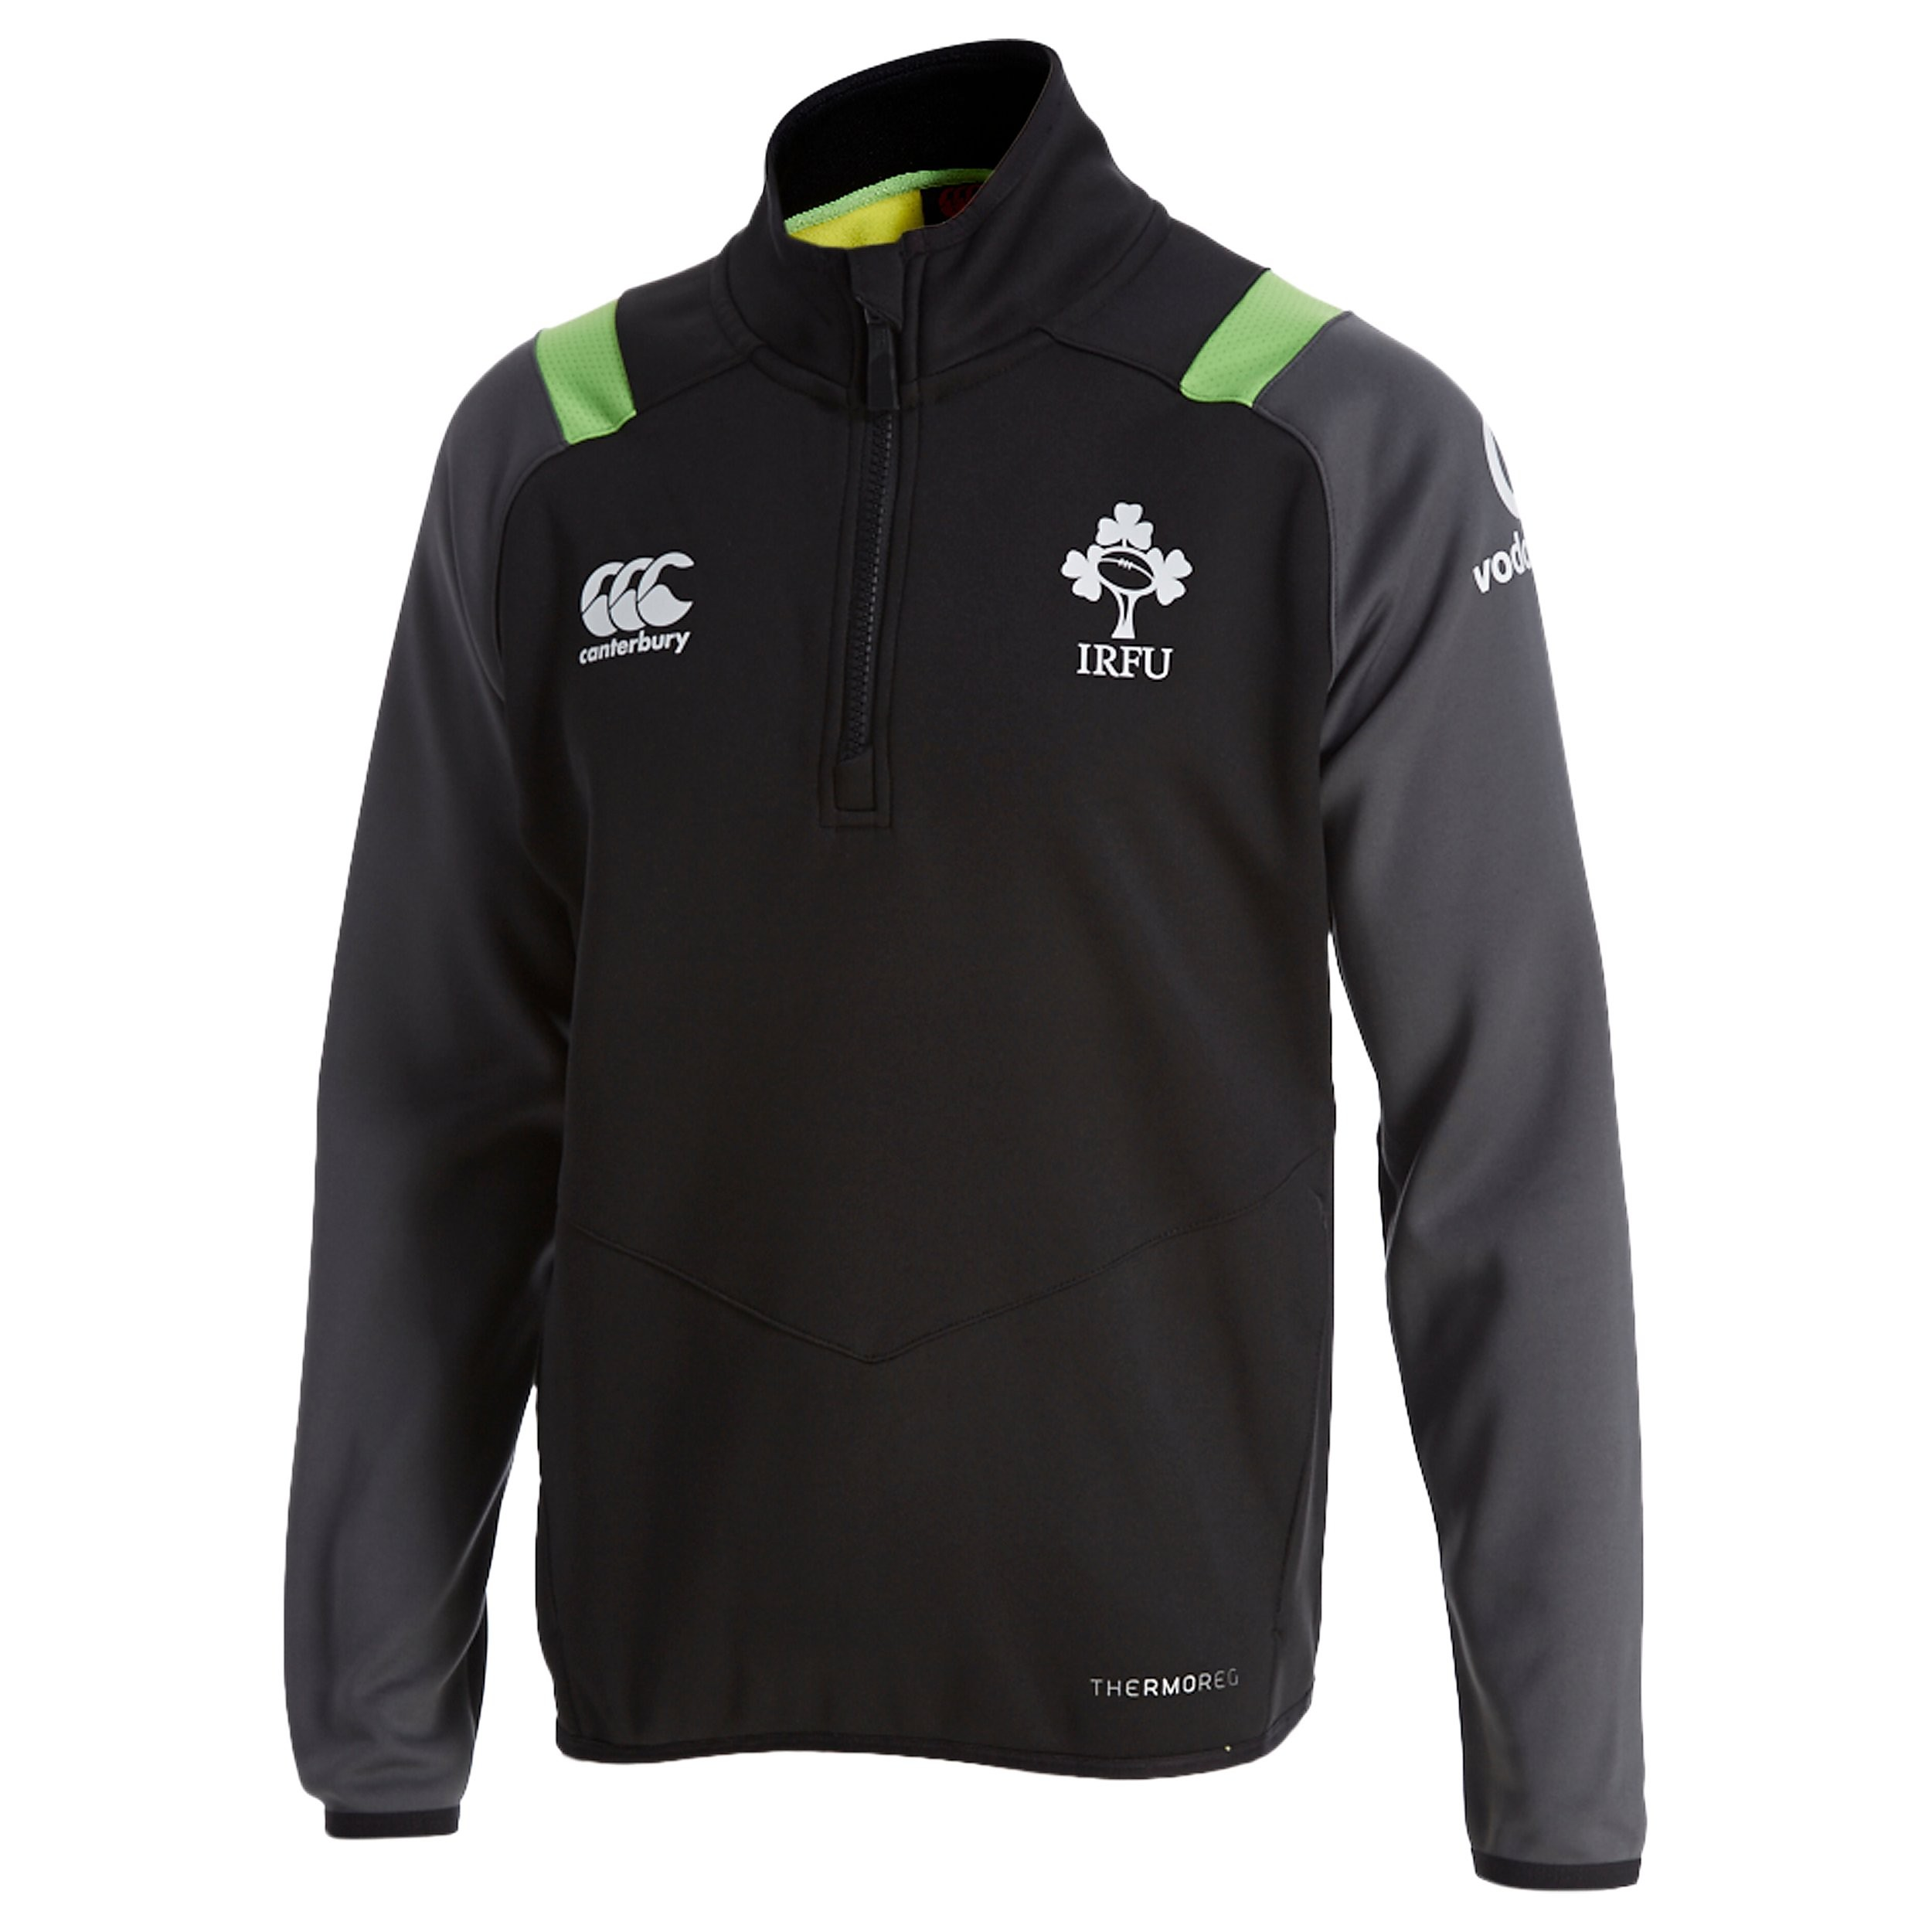 Canterbury Ireland RFU Thermoreg Half Zip Top Junior